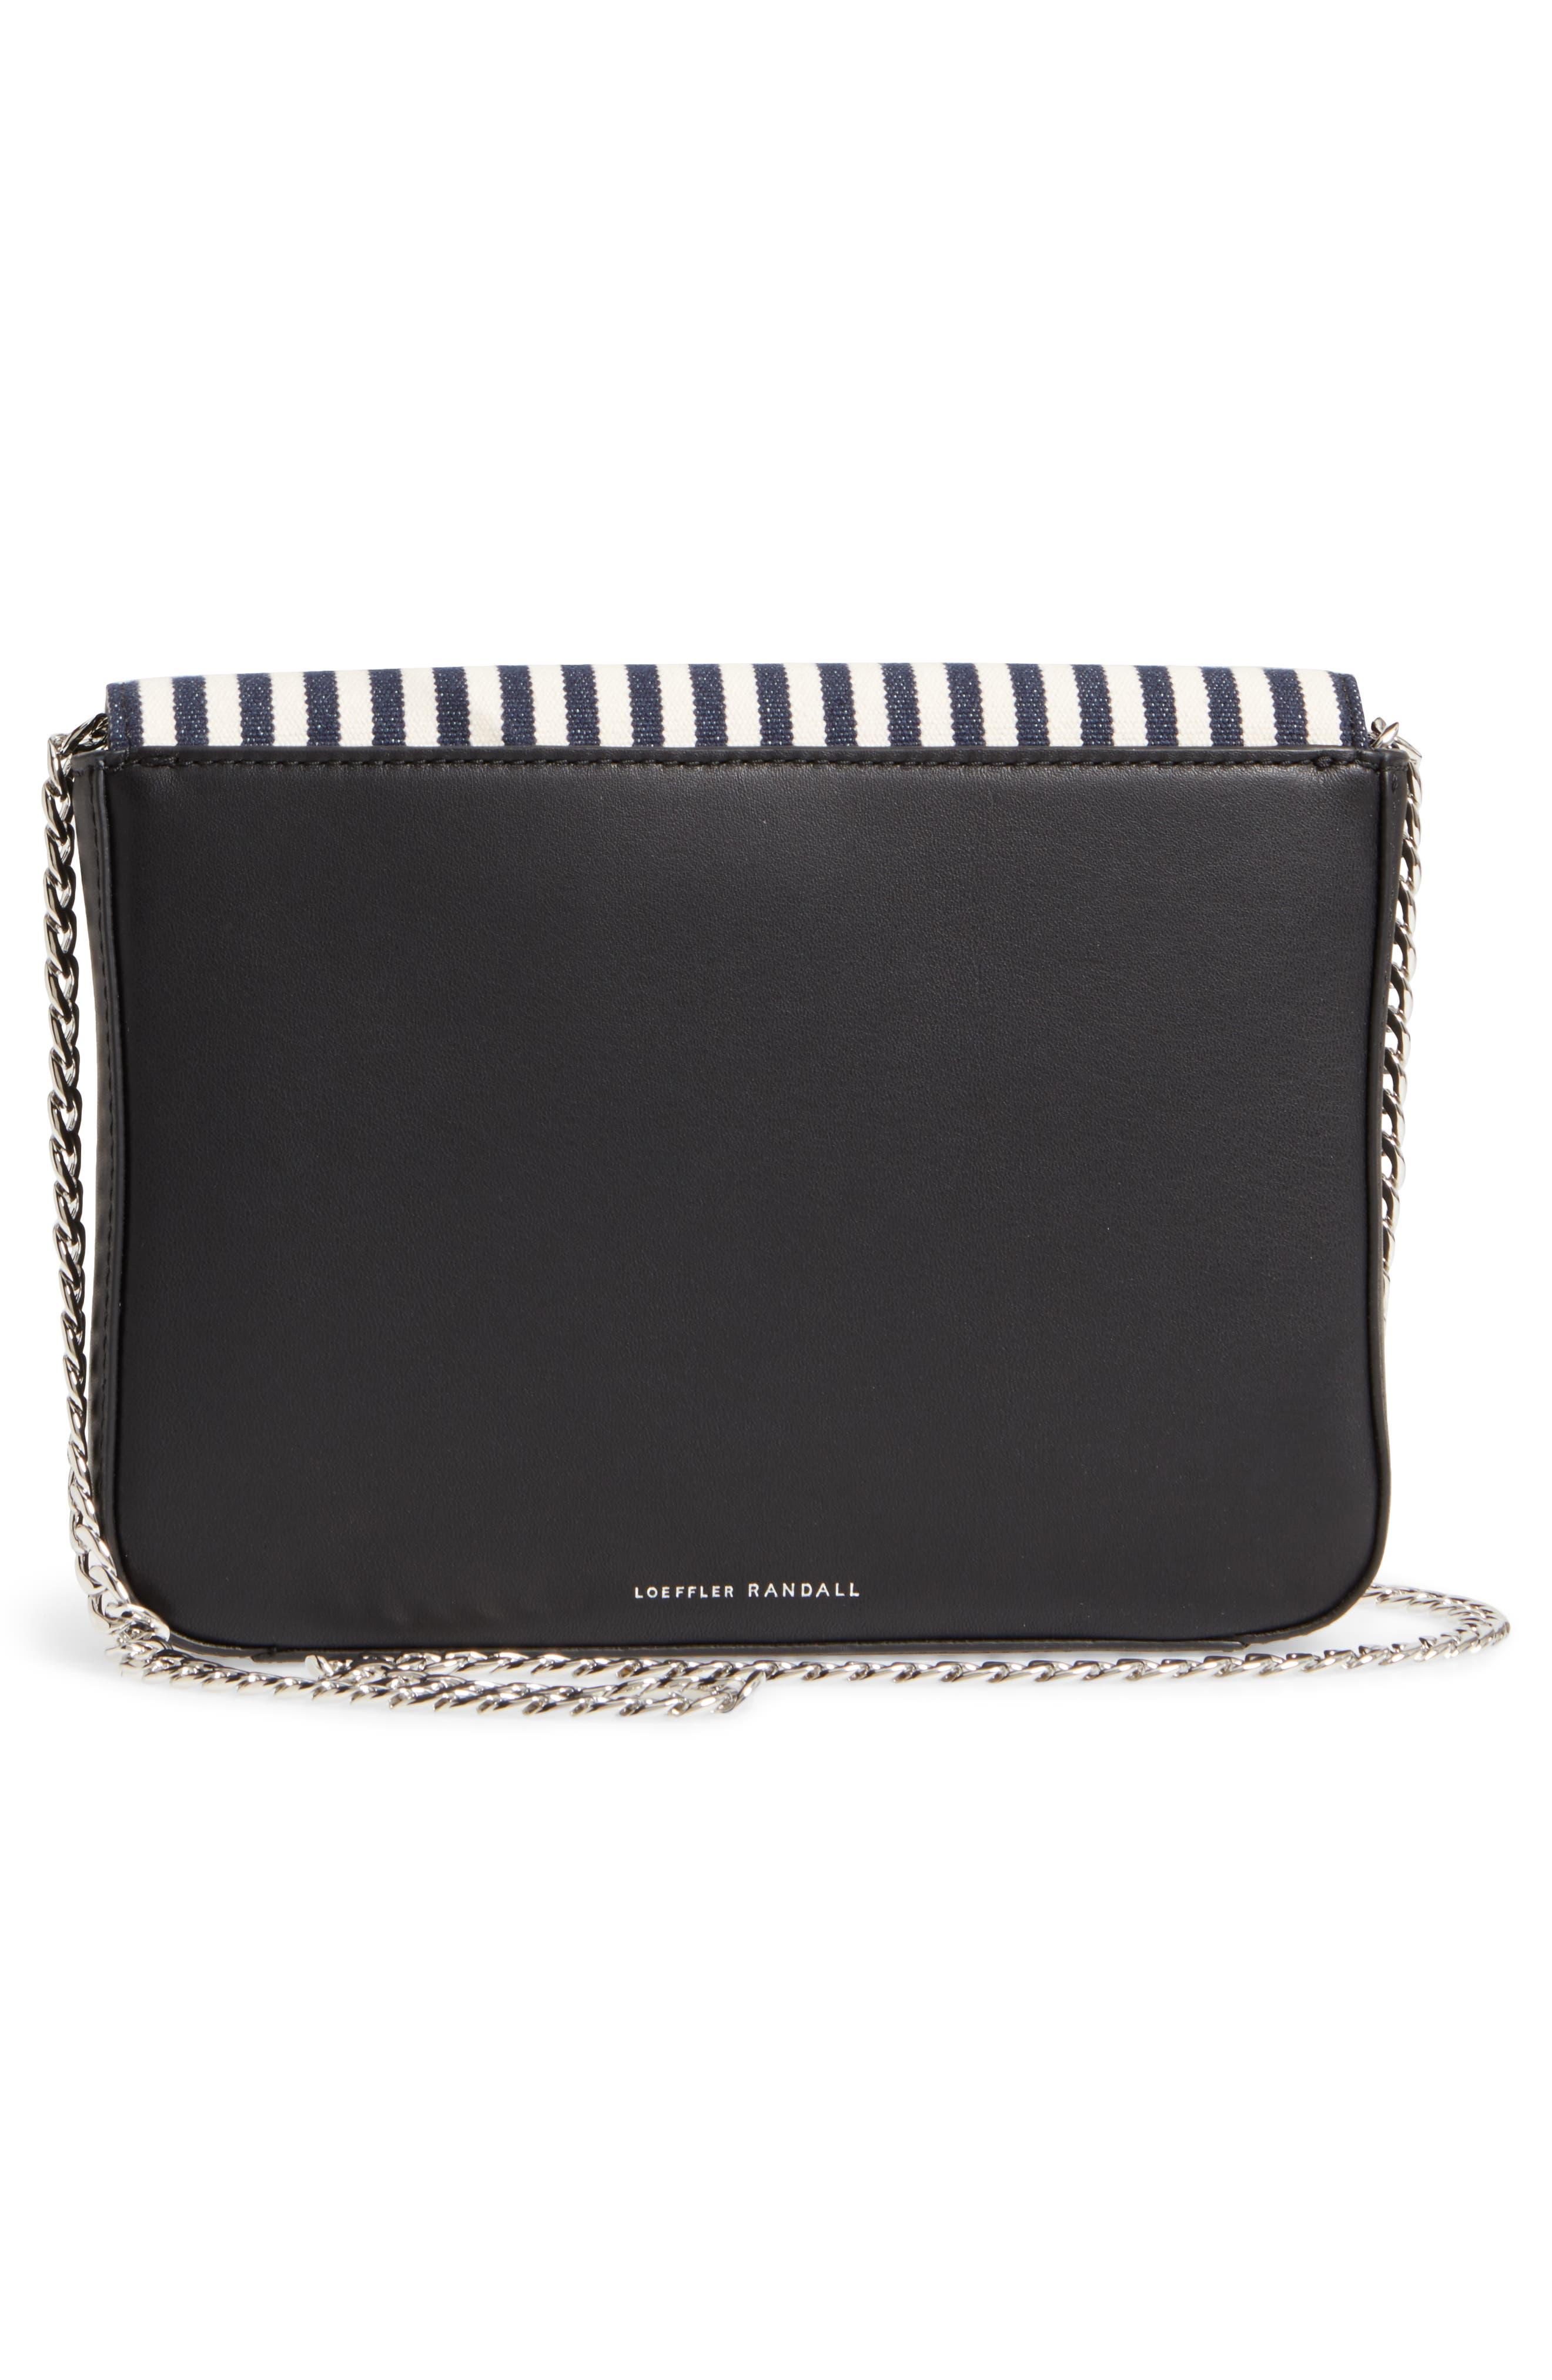 Lock Stripe Clutch/Shoulder Bag,                             Alternate thumbnail 3, color,                             White/ Eclipse